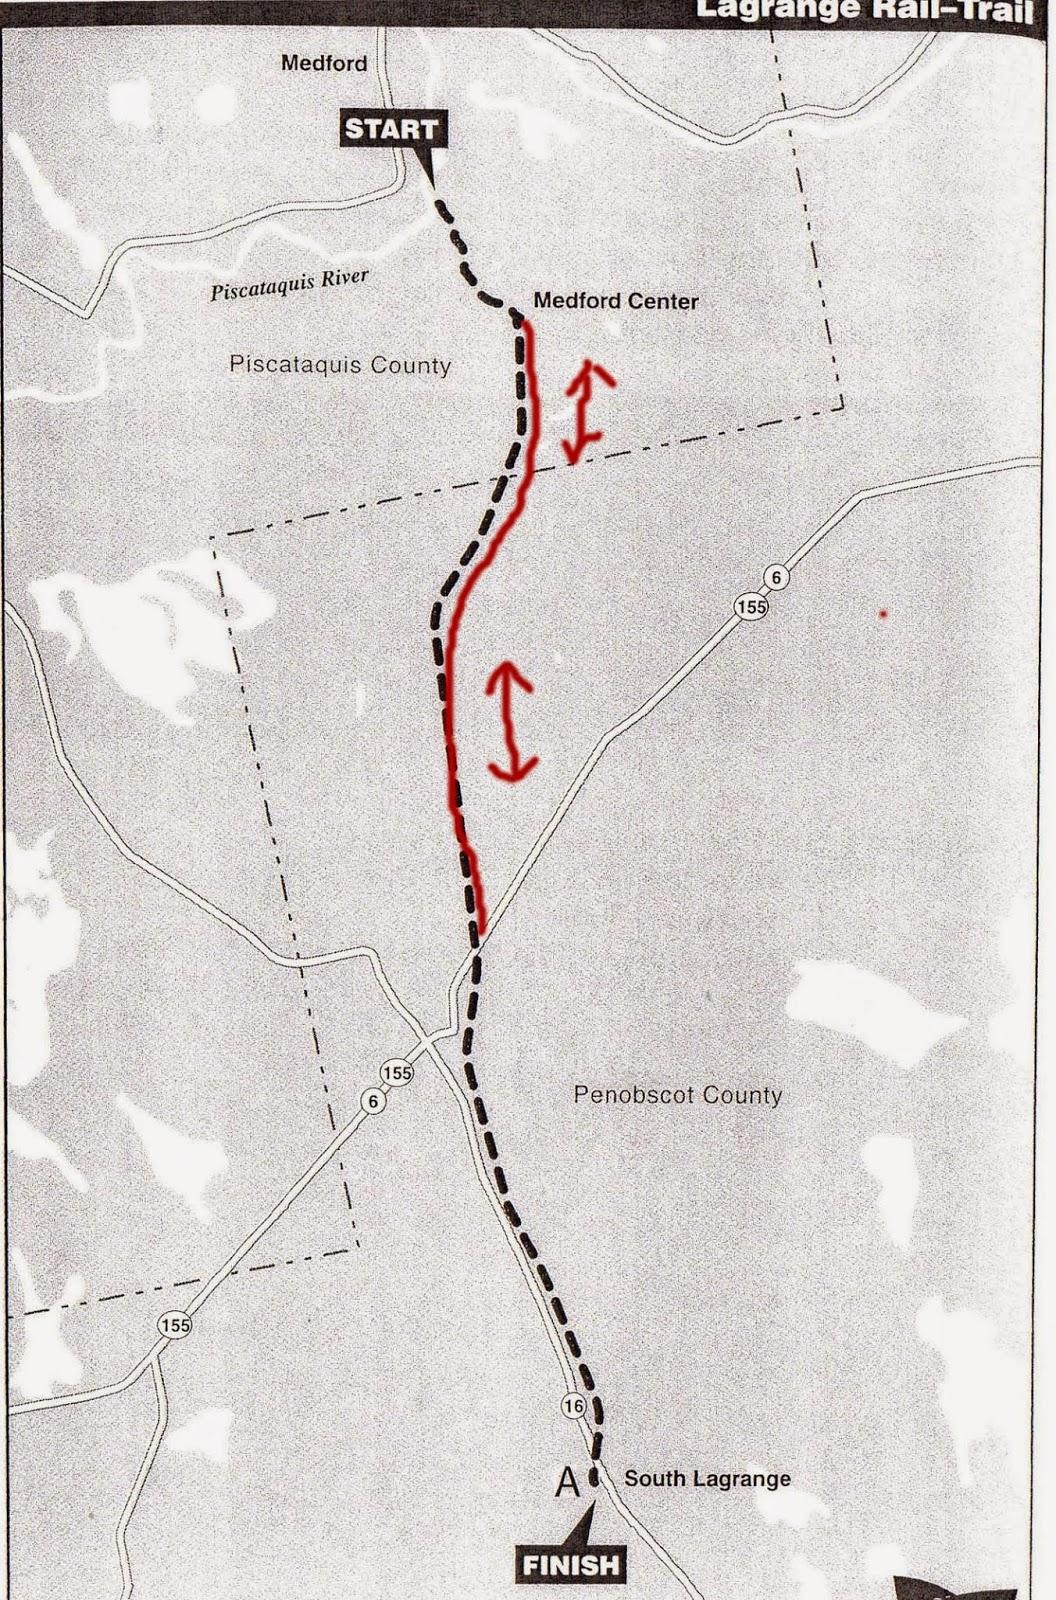 Hiking In Maine With Kelley  Lagrange RailTrail - Us rail trail map